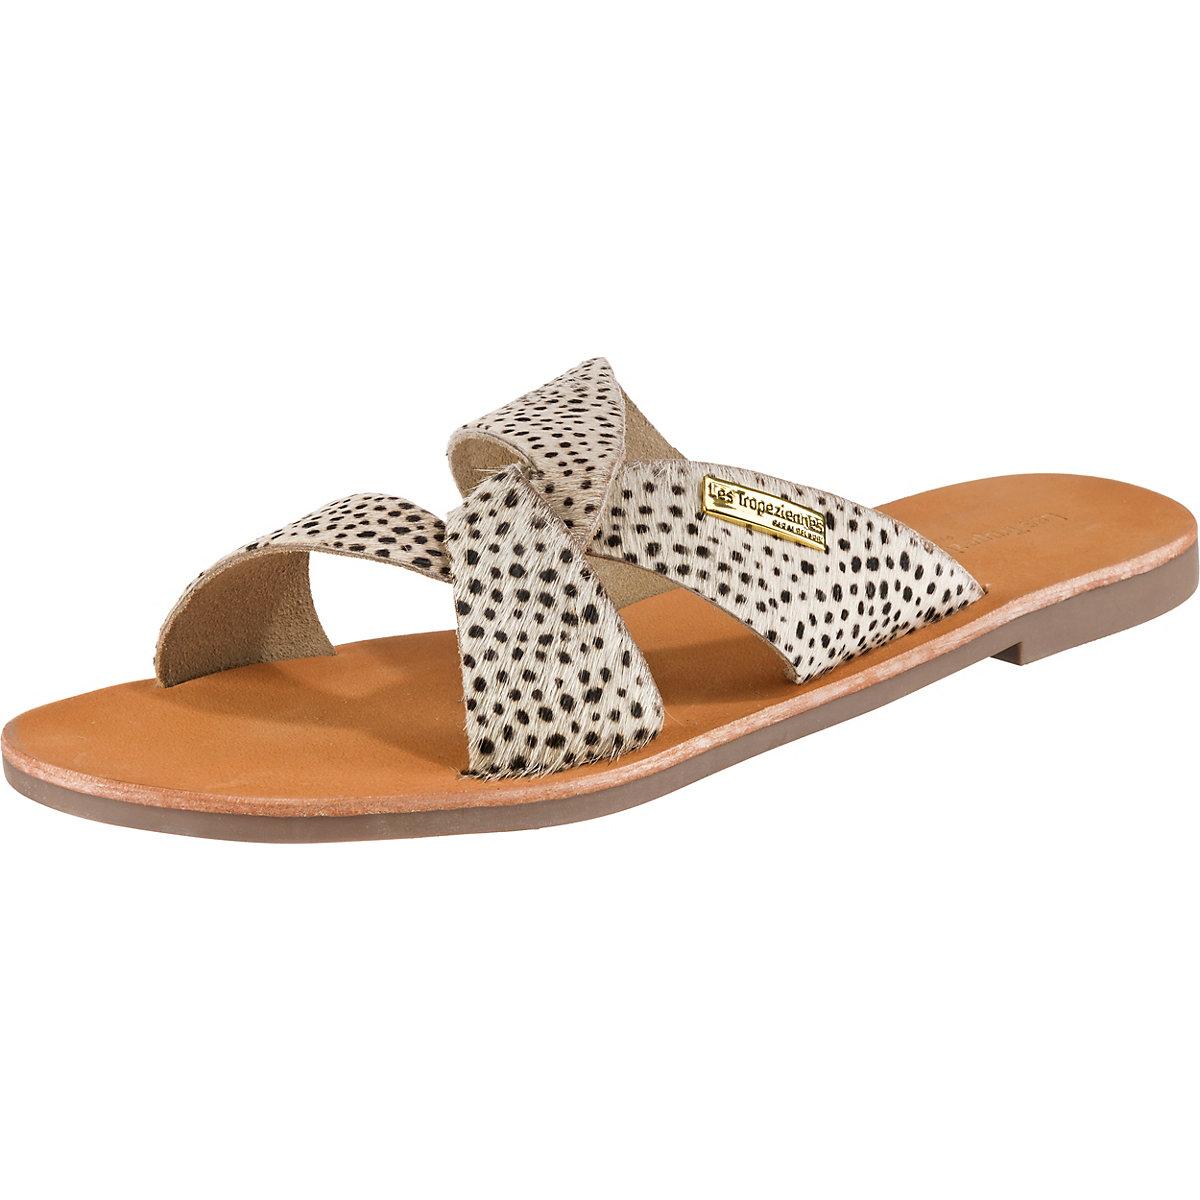 LES TROPEZIENNES, Placide Pantoletten, schwarz weiß  Gute Qualität beliebte Schuhe